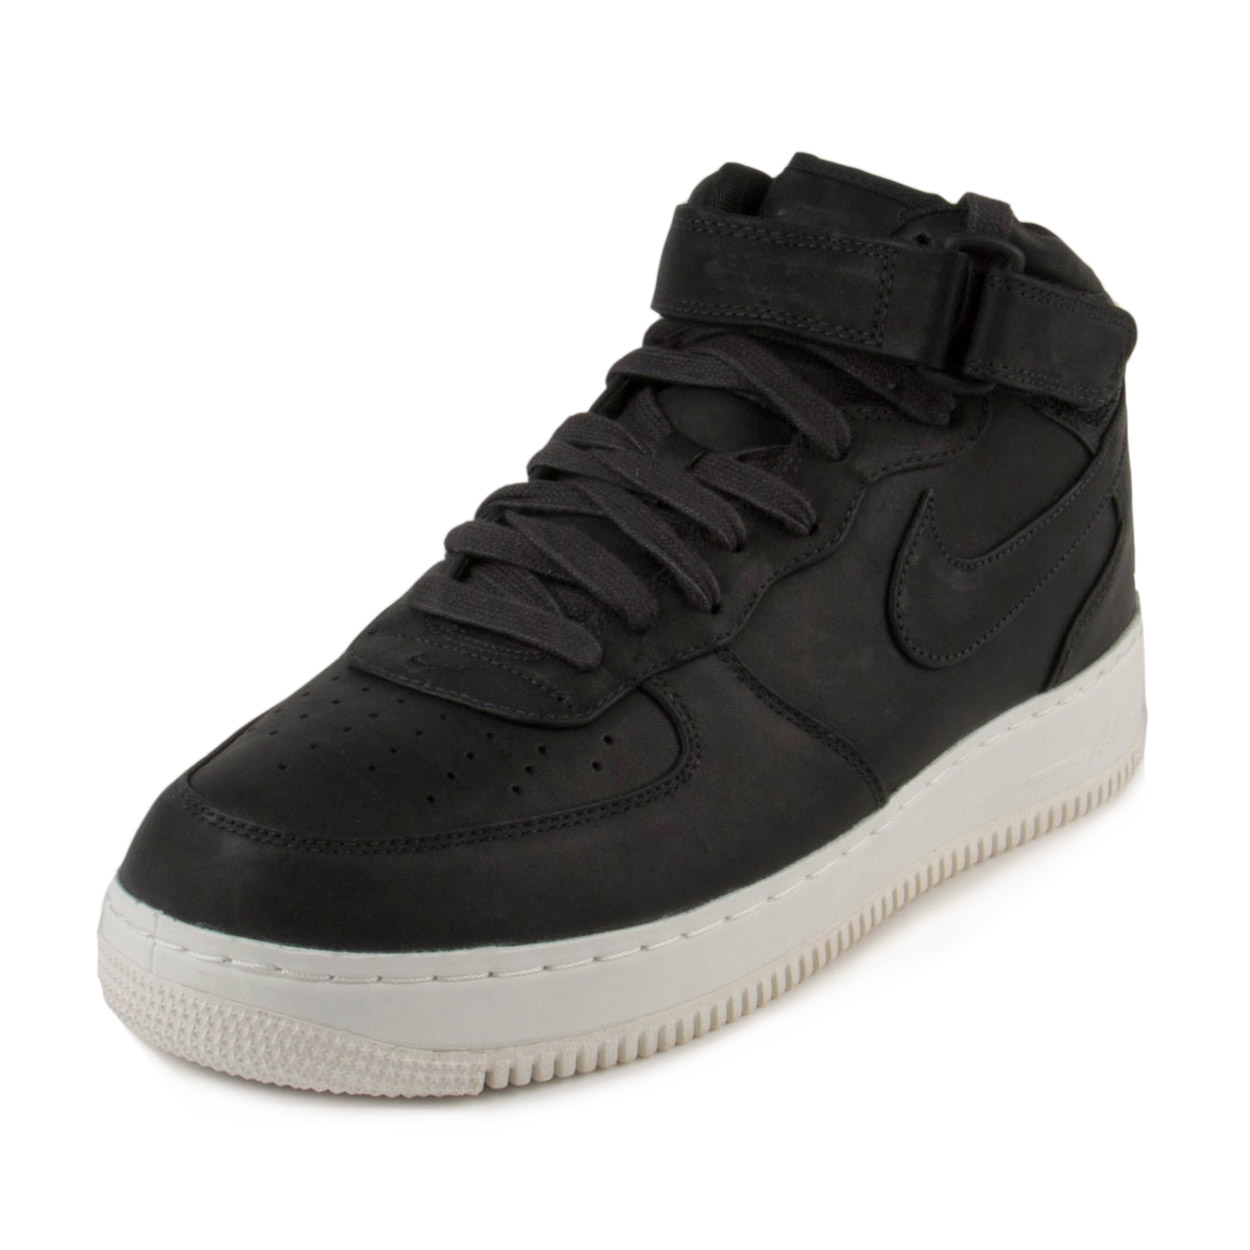 Nike Mens Lab Air Force 1 Mid Black/Sail 905619-001